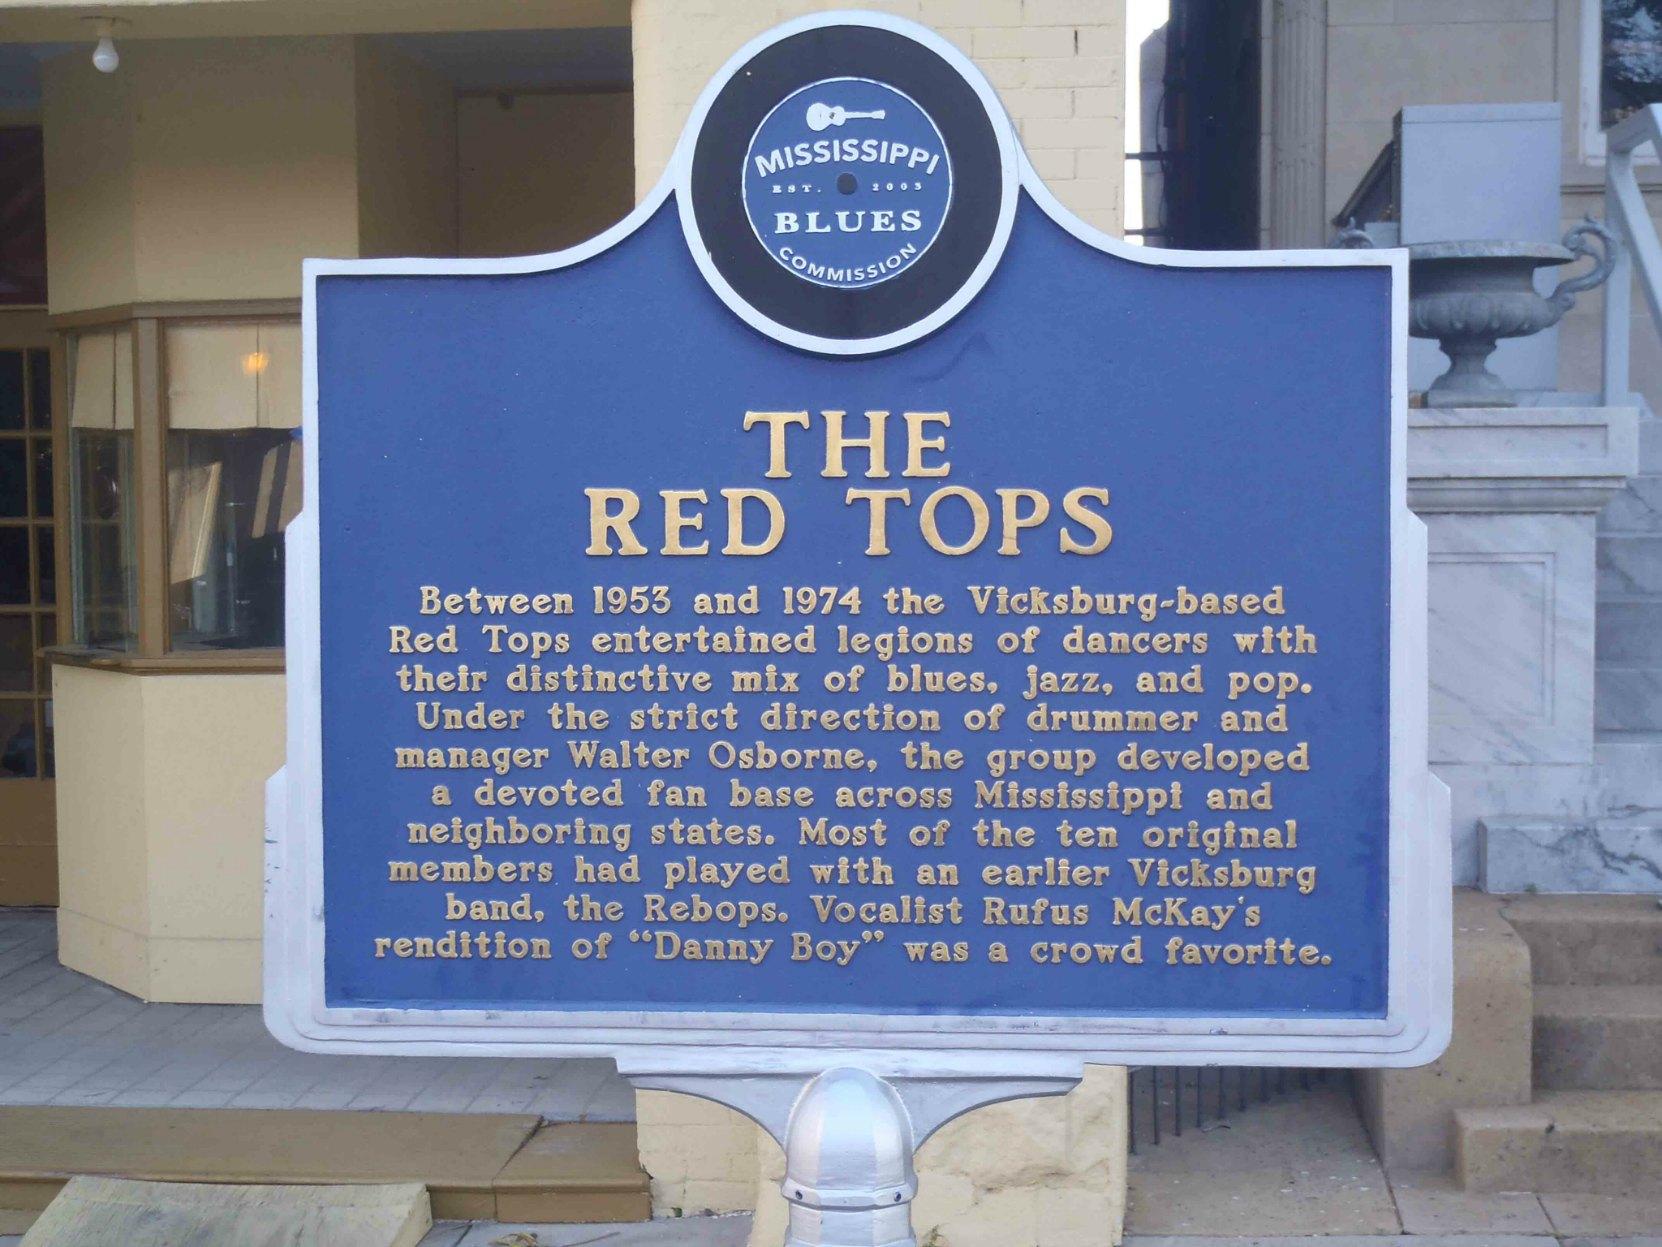 Mississippi Blues Trail marker for The Red Tops, Vicksburg, Mississippi